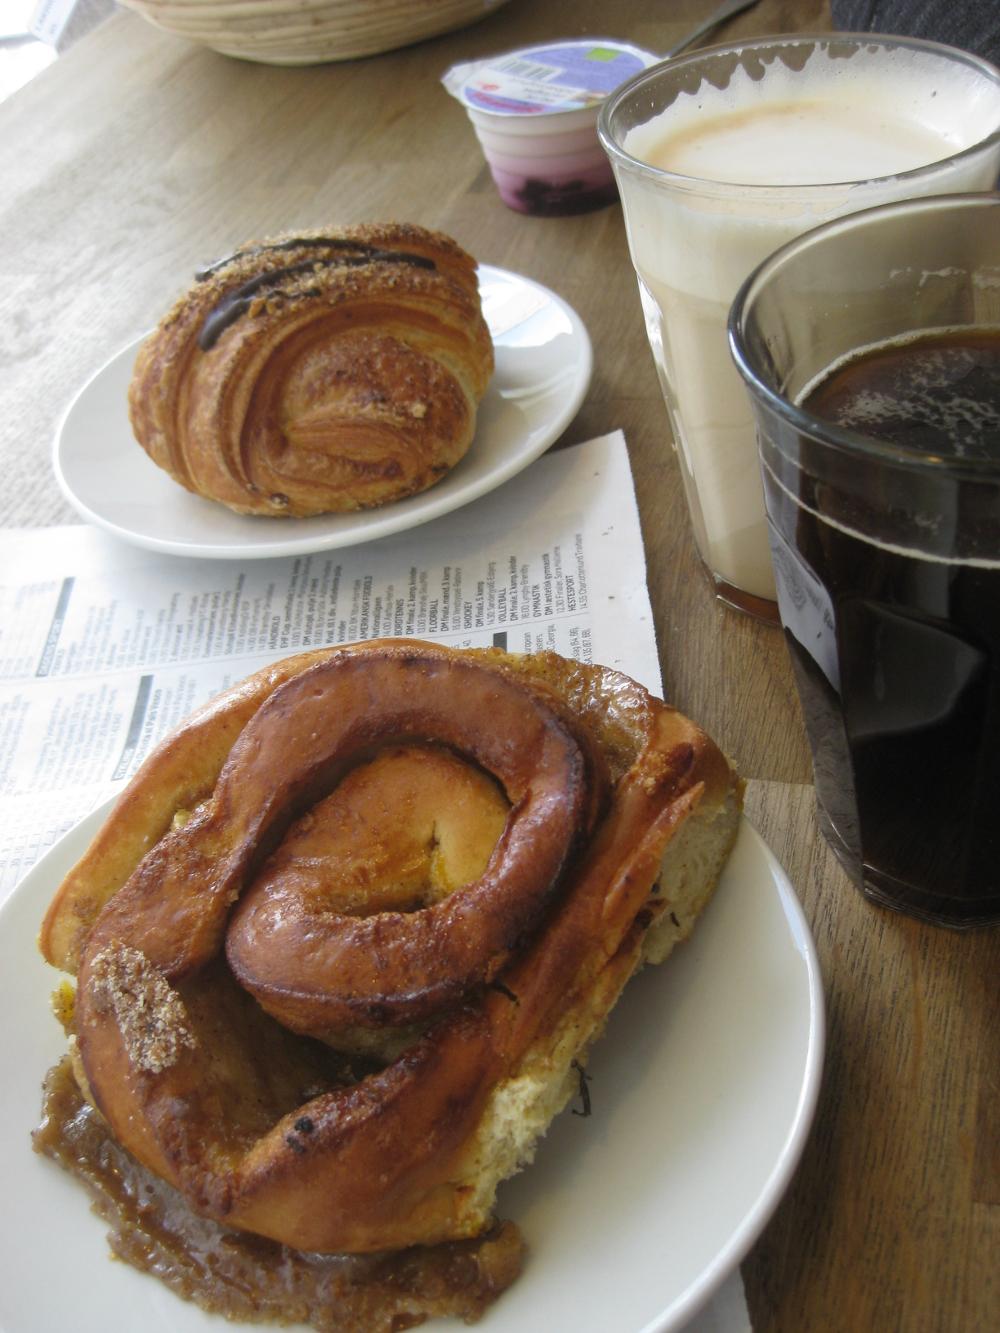 Emmerys bakery for breakfast in Copenhagen, Denmark